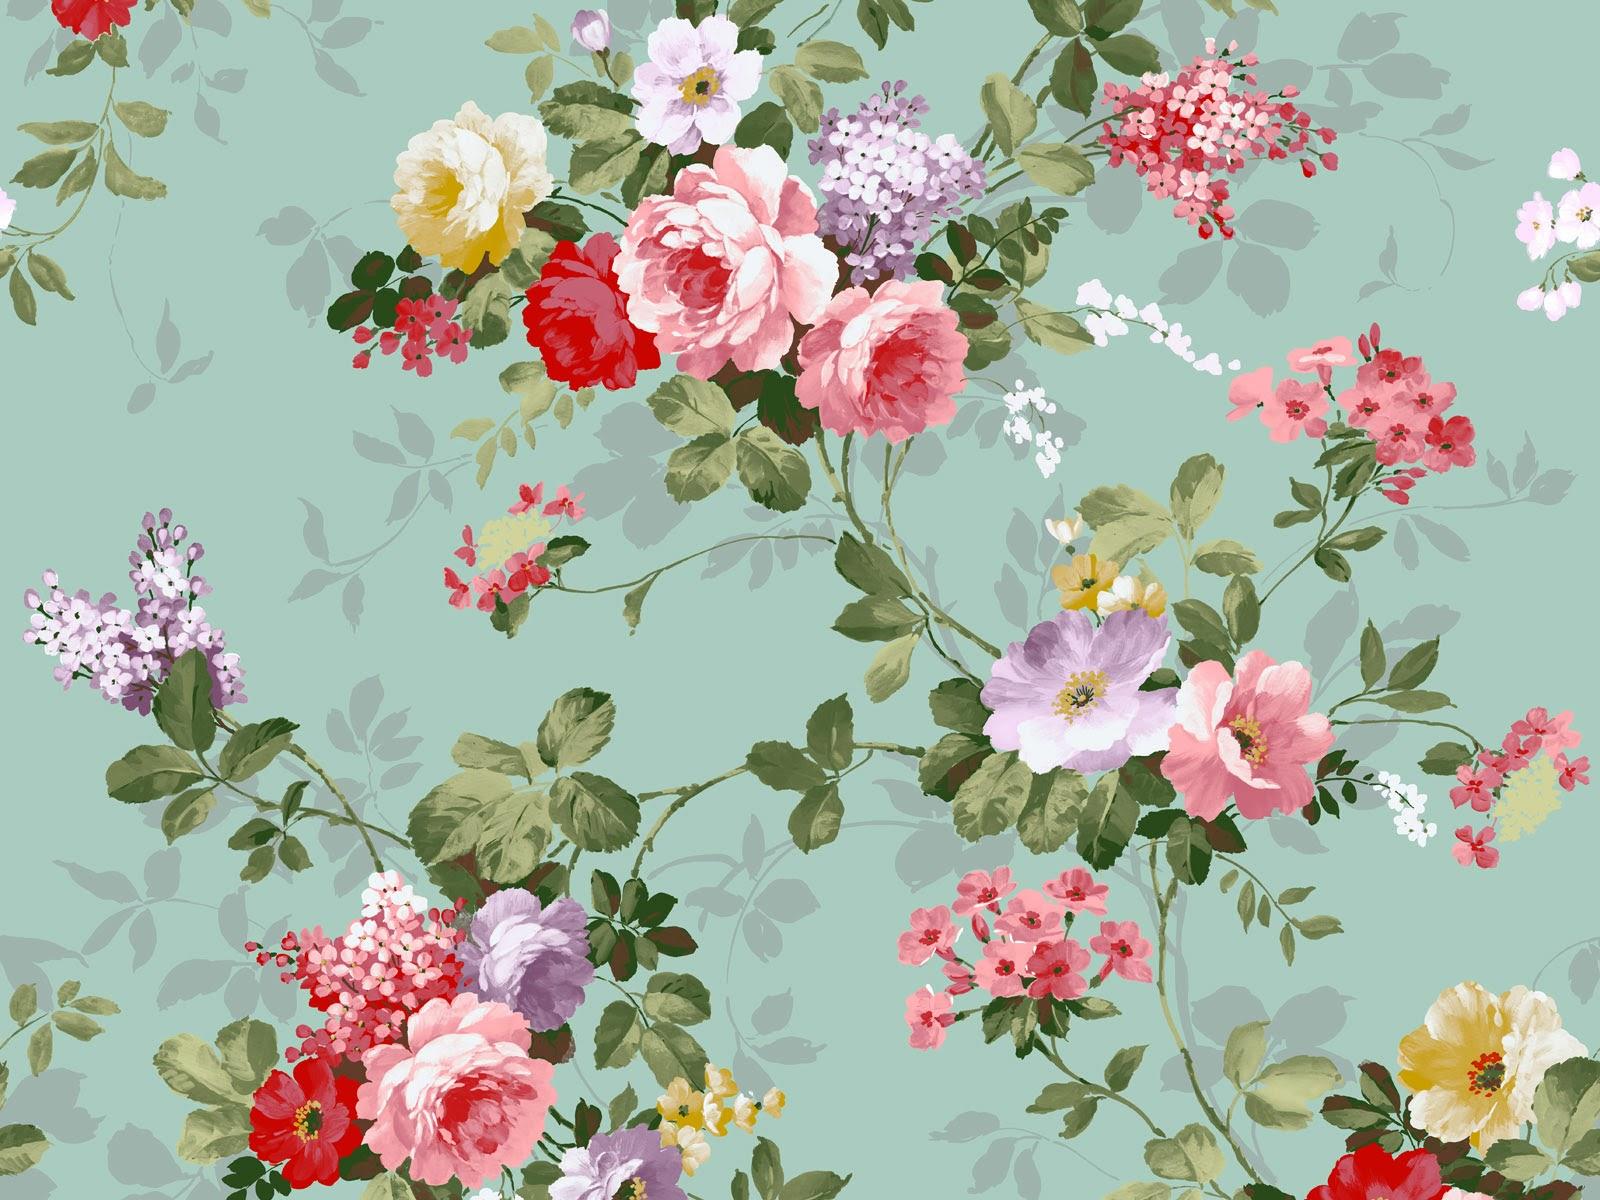 Flower Wallpaper Tumblr Iphone Wallpapers Pinterest 1600x1200